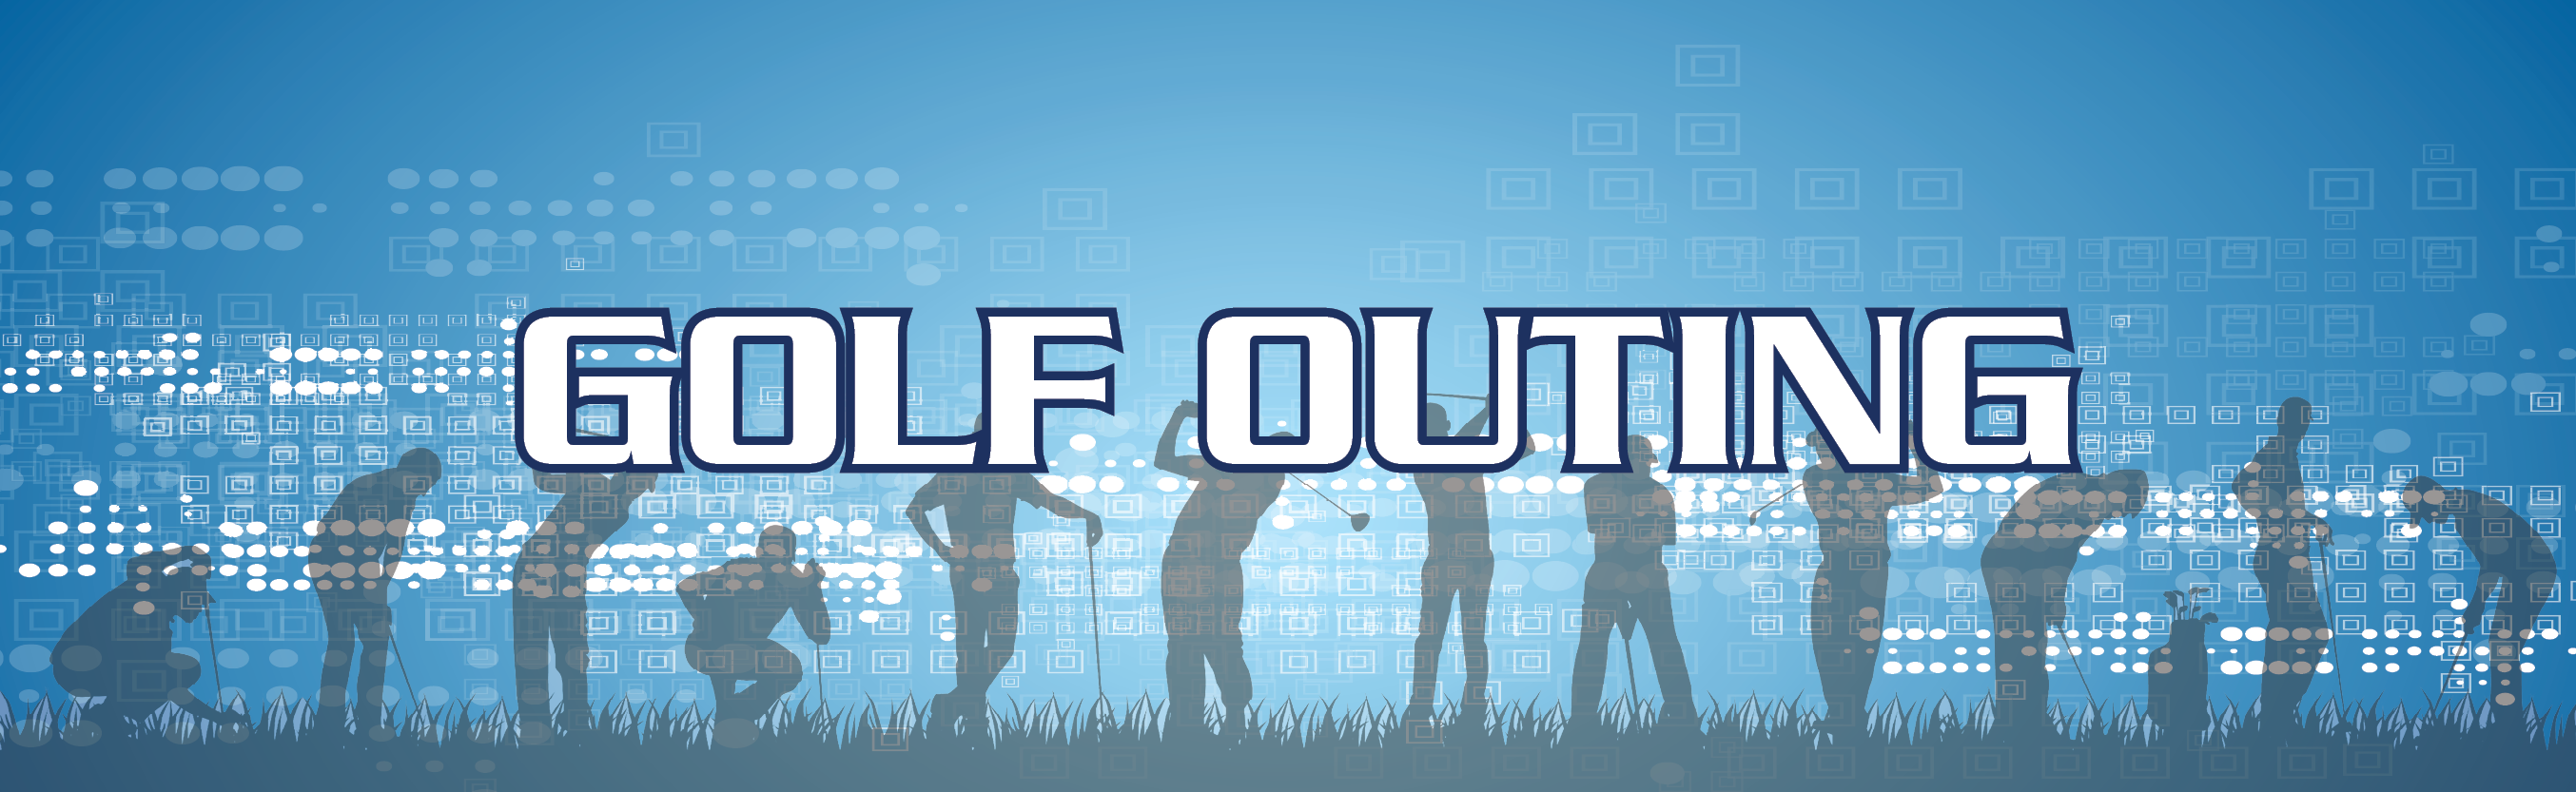 2021 - Website Headers (Golf Outing)